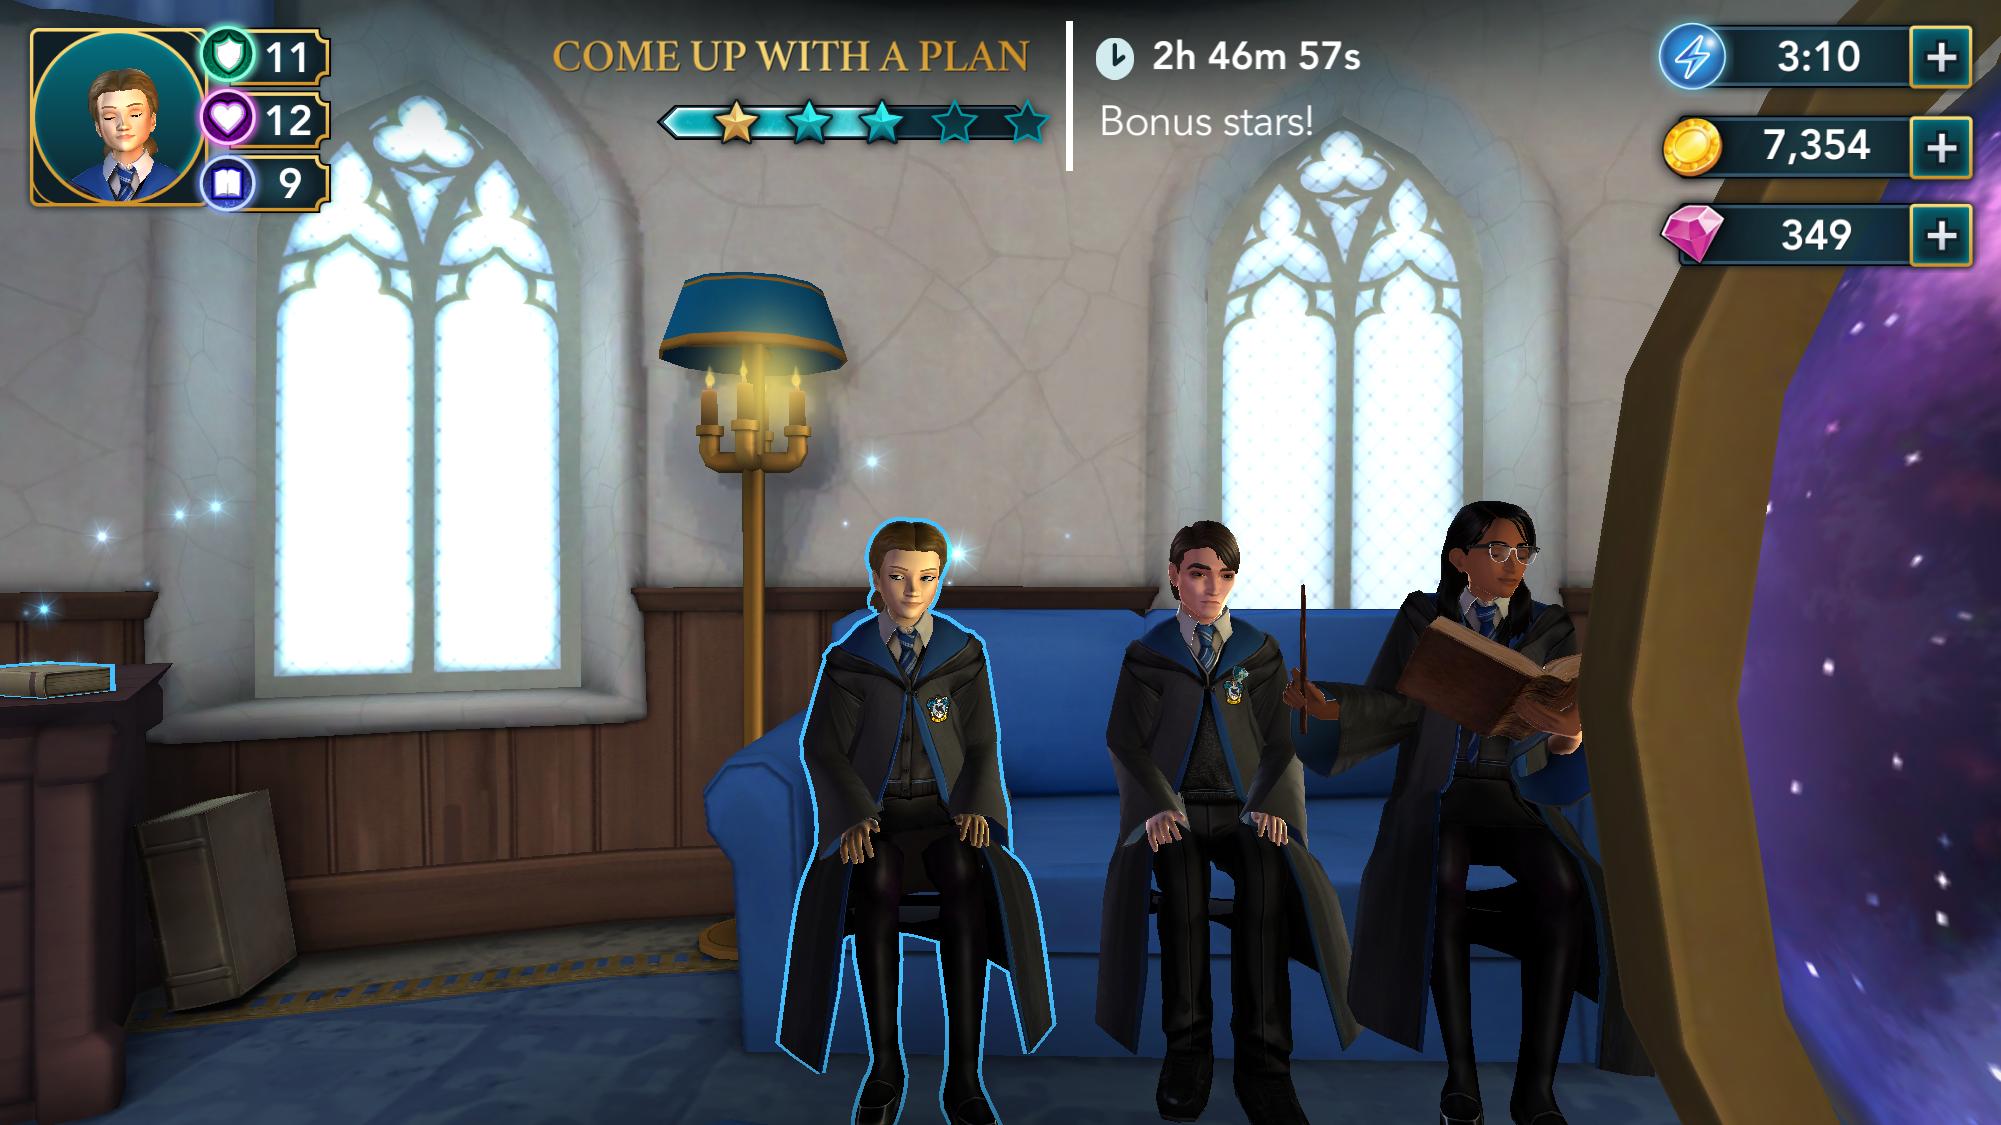 Pin By Raina2 On Harry Potter Hogwarts Mystery Game Harry Potter Universal Hogwarts Mystery Harry Potter Movies